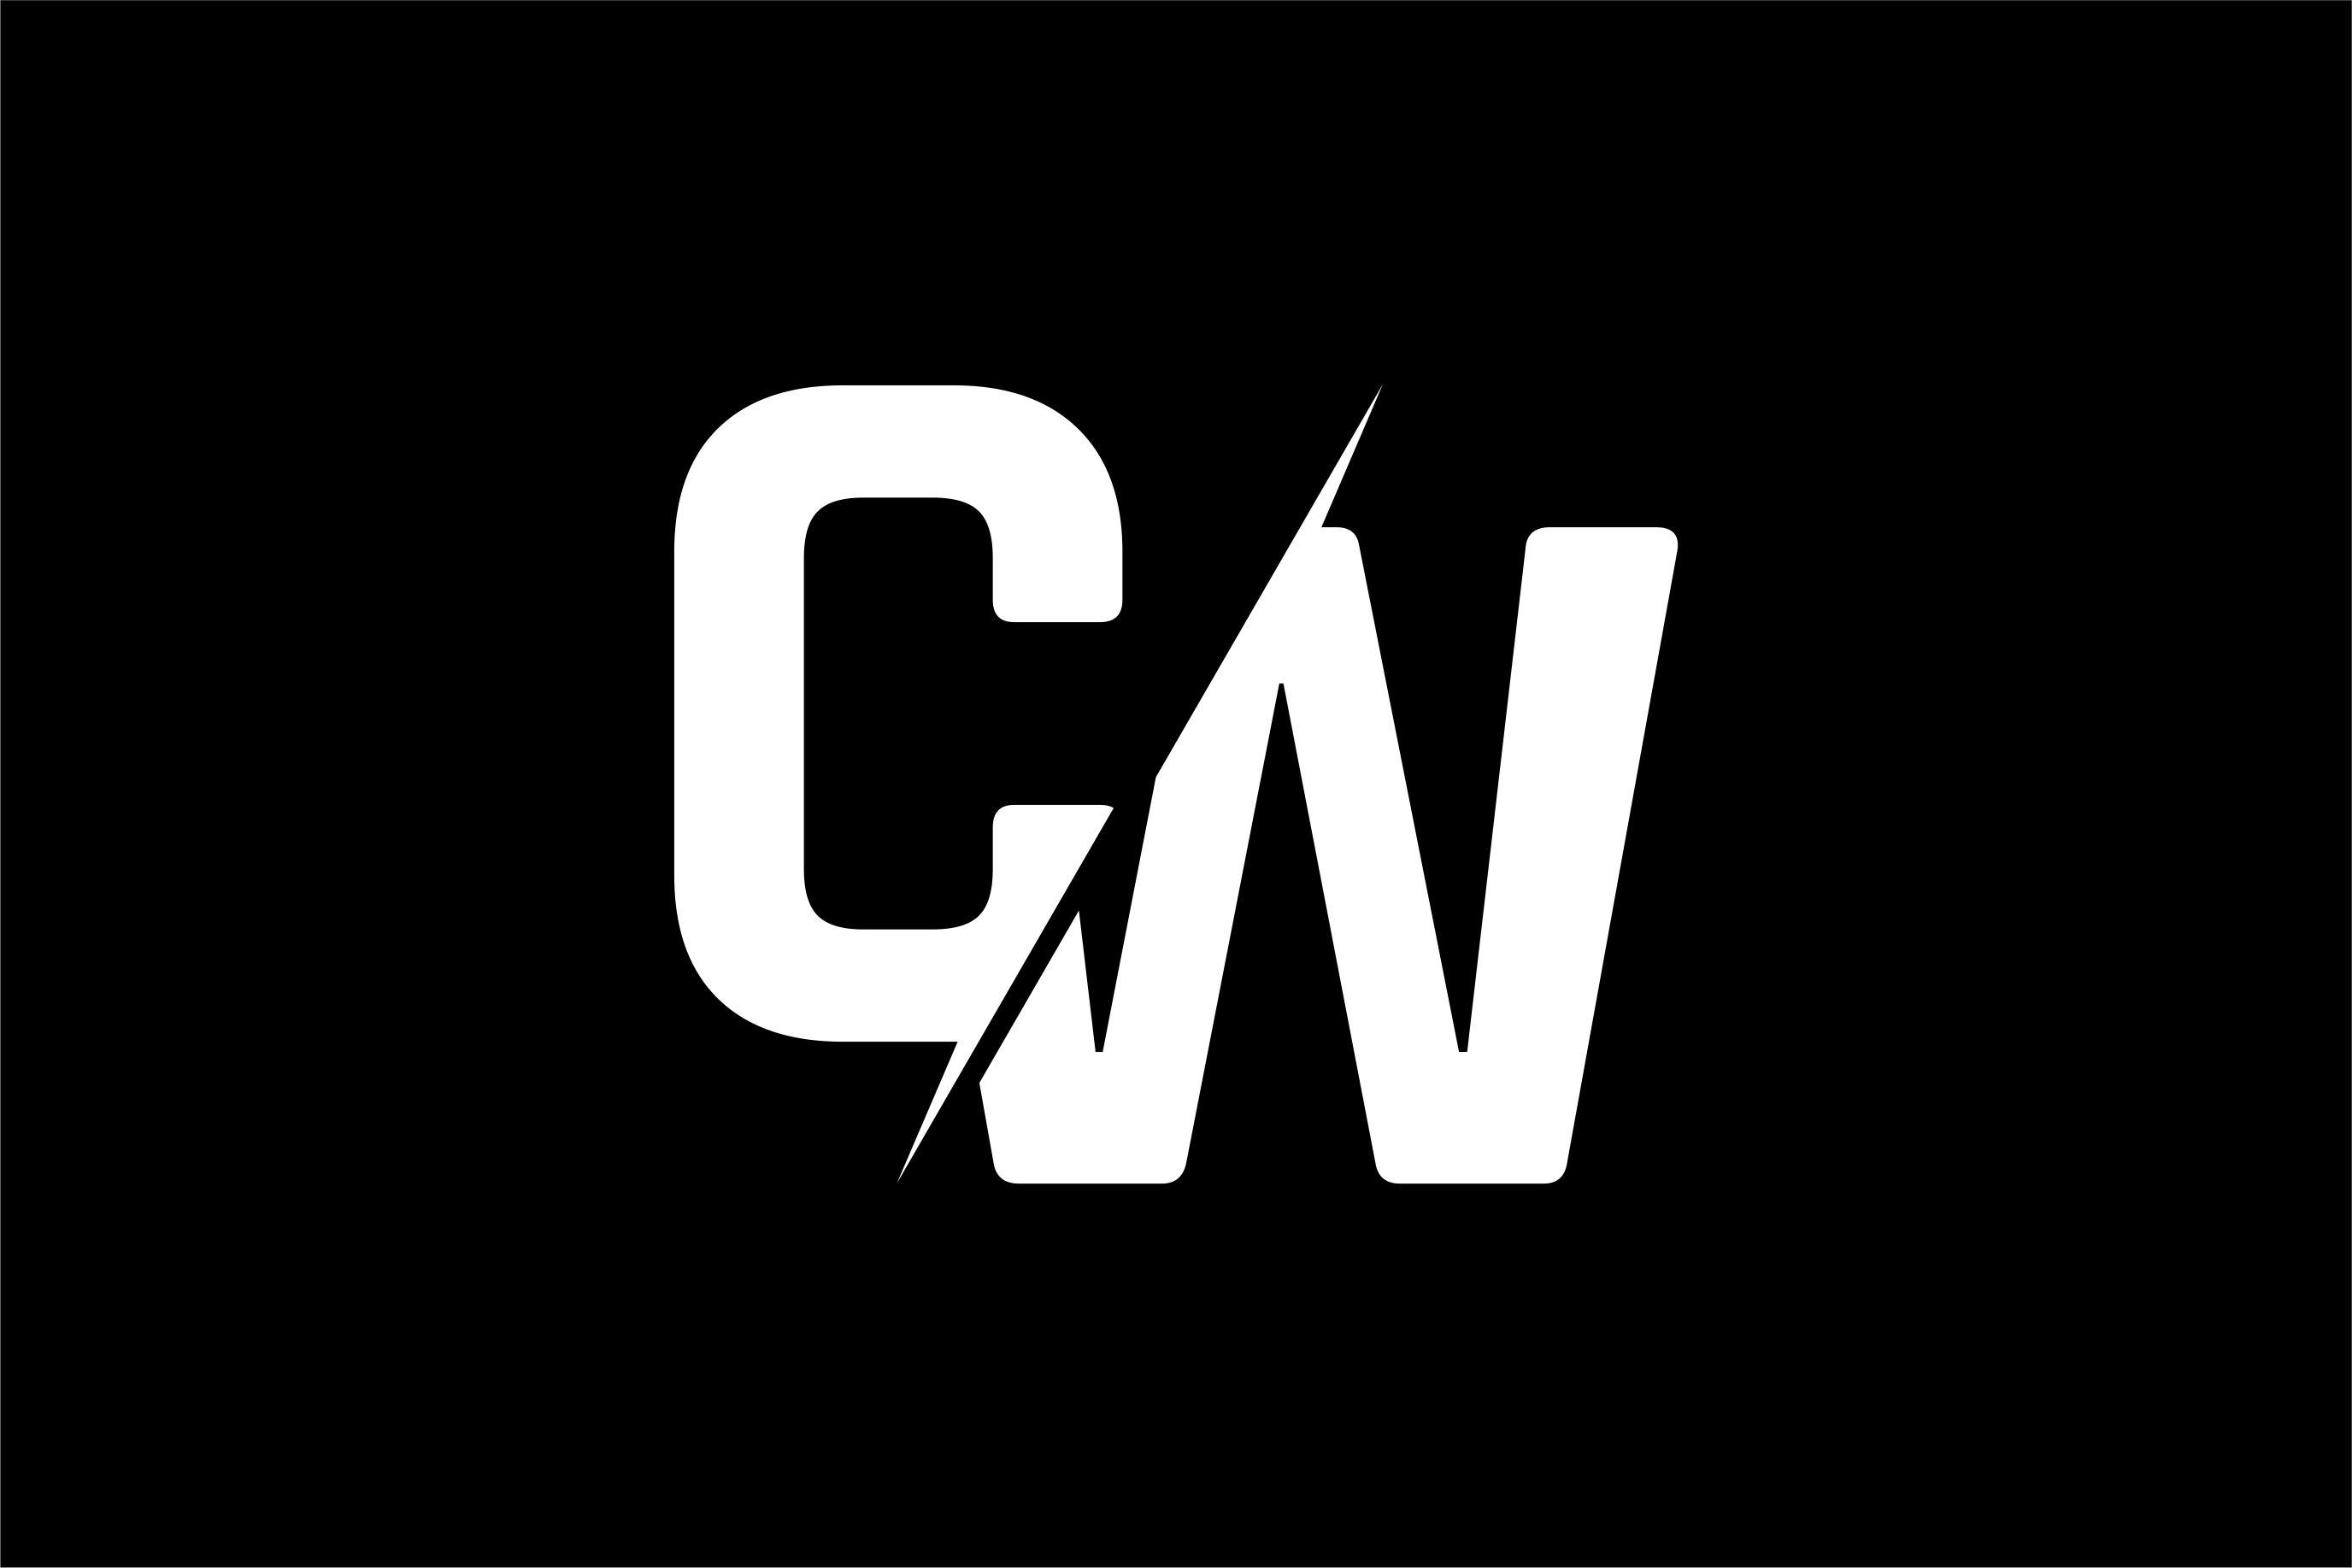 Monogram Cw Logo Graphic By Greenlines Studios Creative Fabrica Logo Design Graphic Design Logo Garage Logo